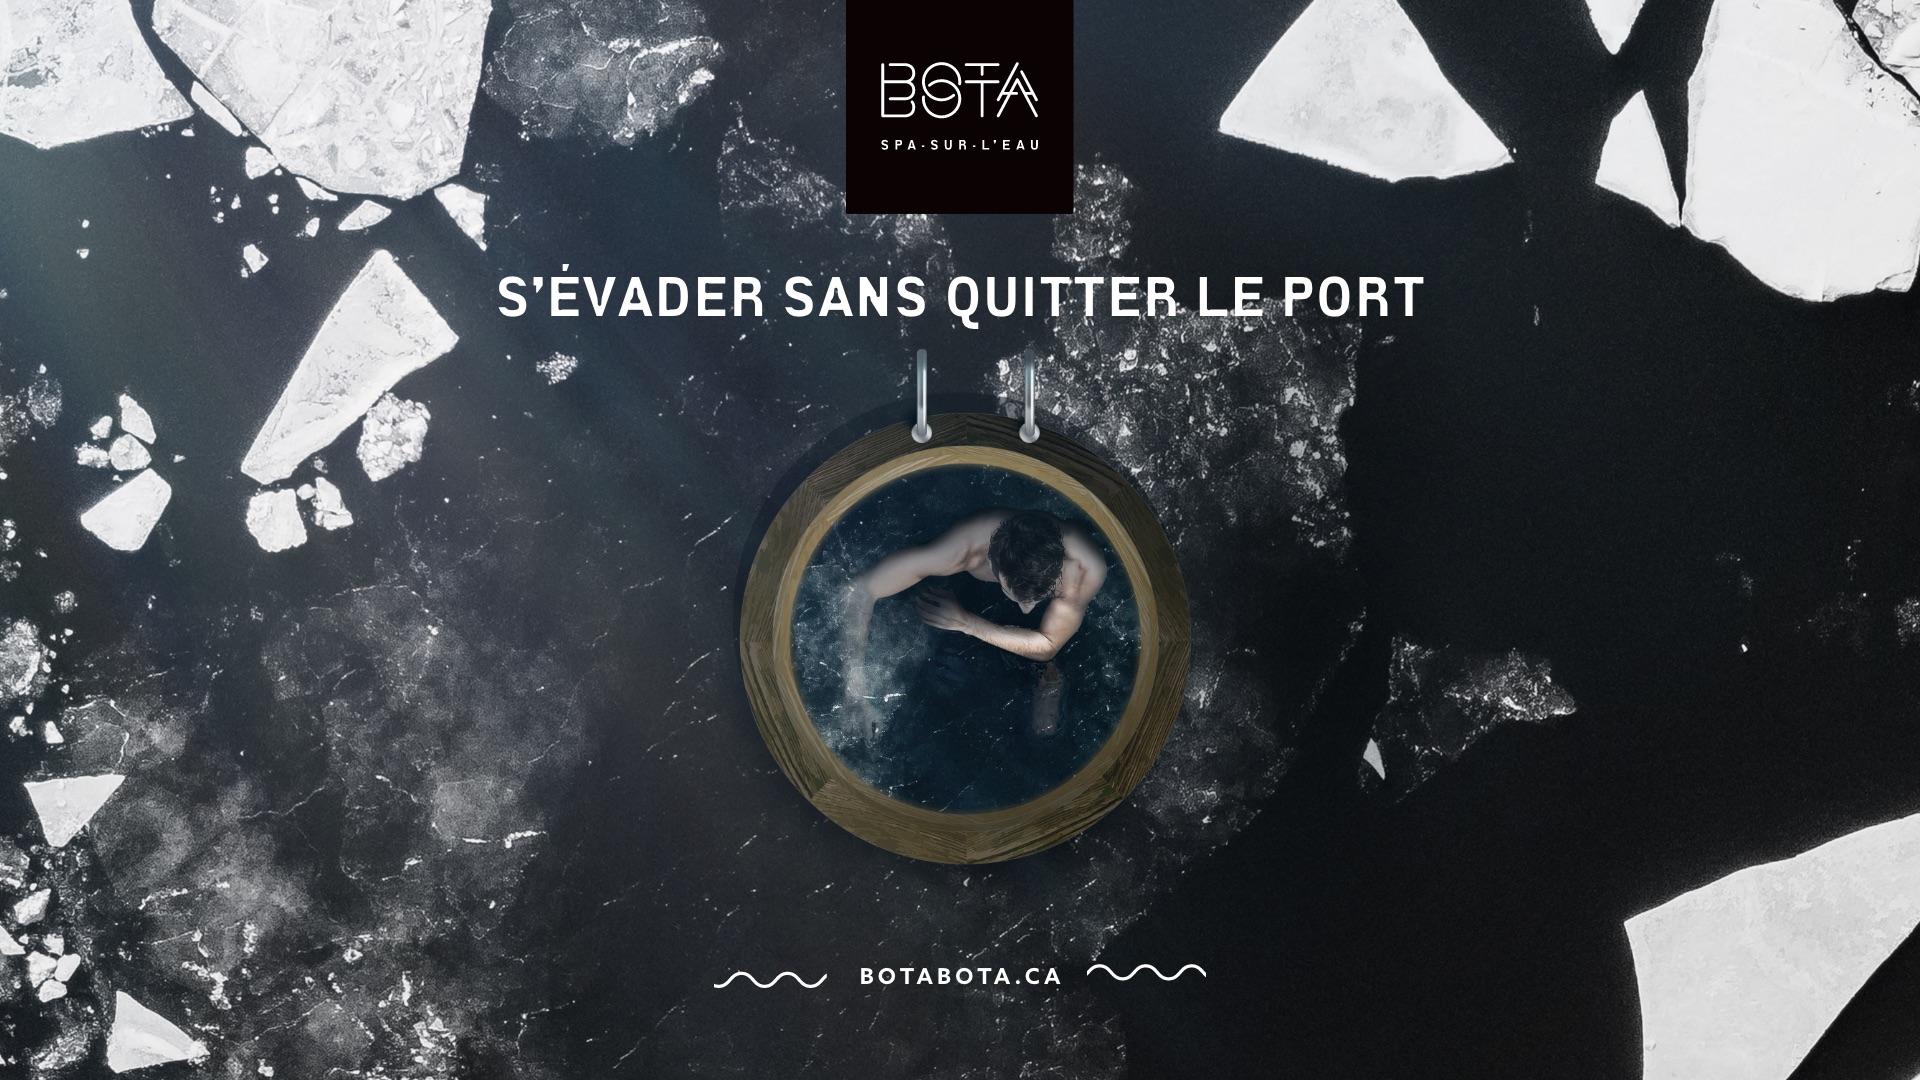 Bota Bota – S'évader sans quitter le port